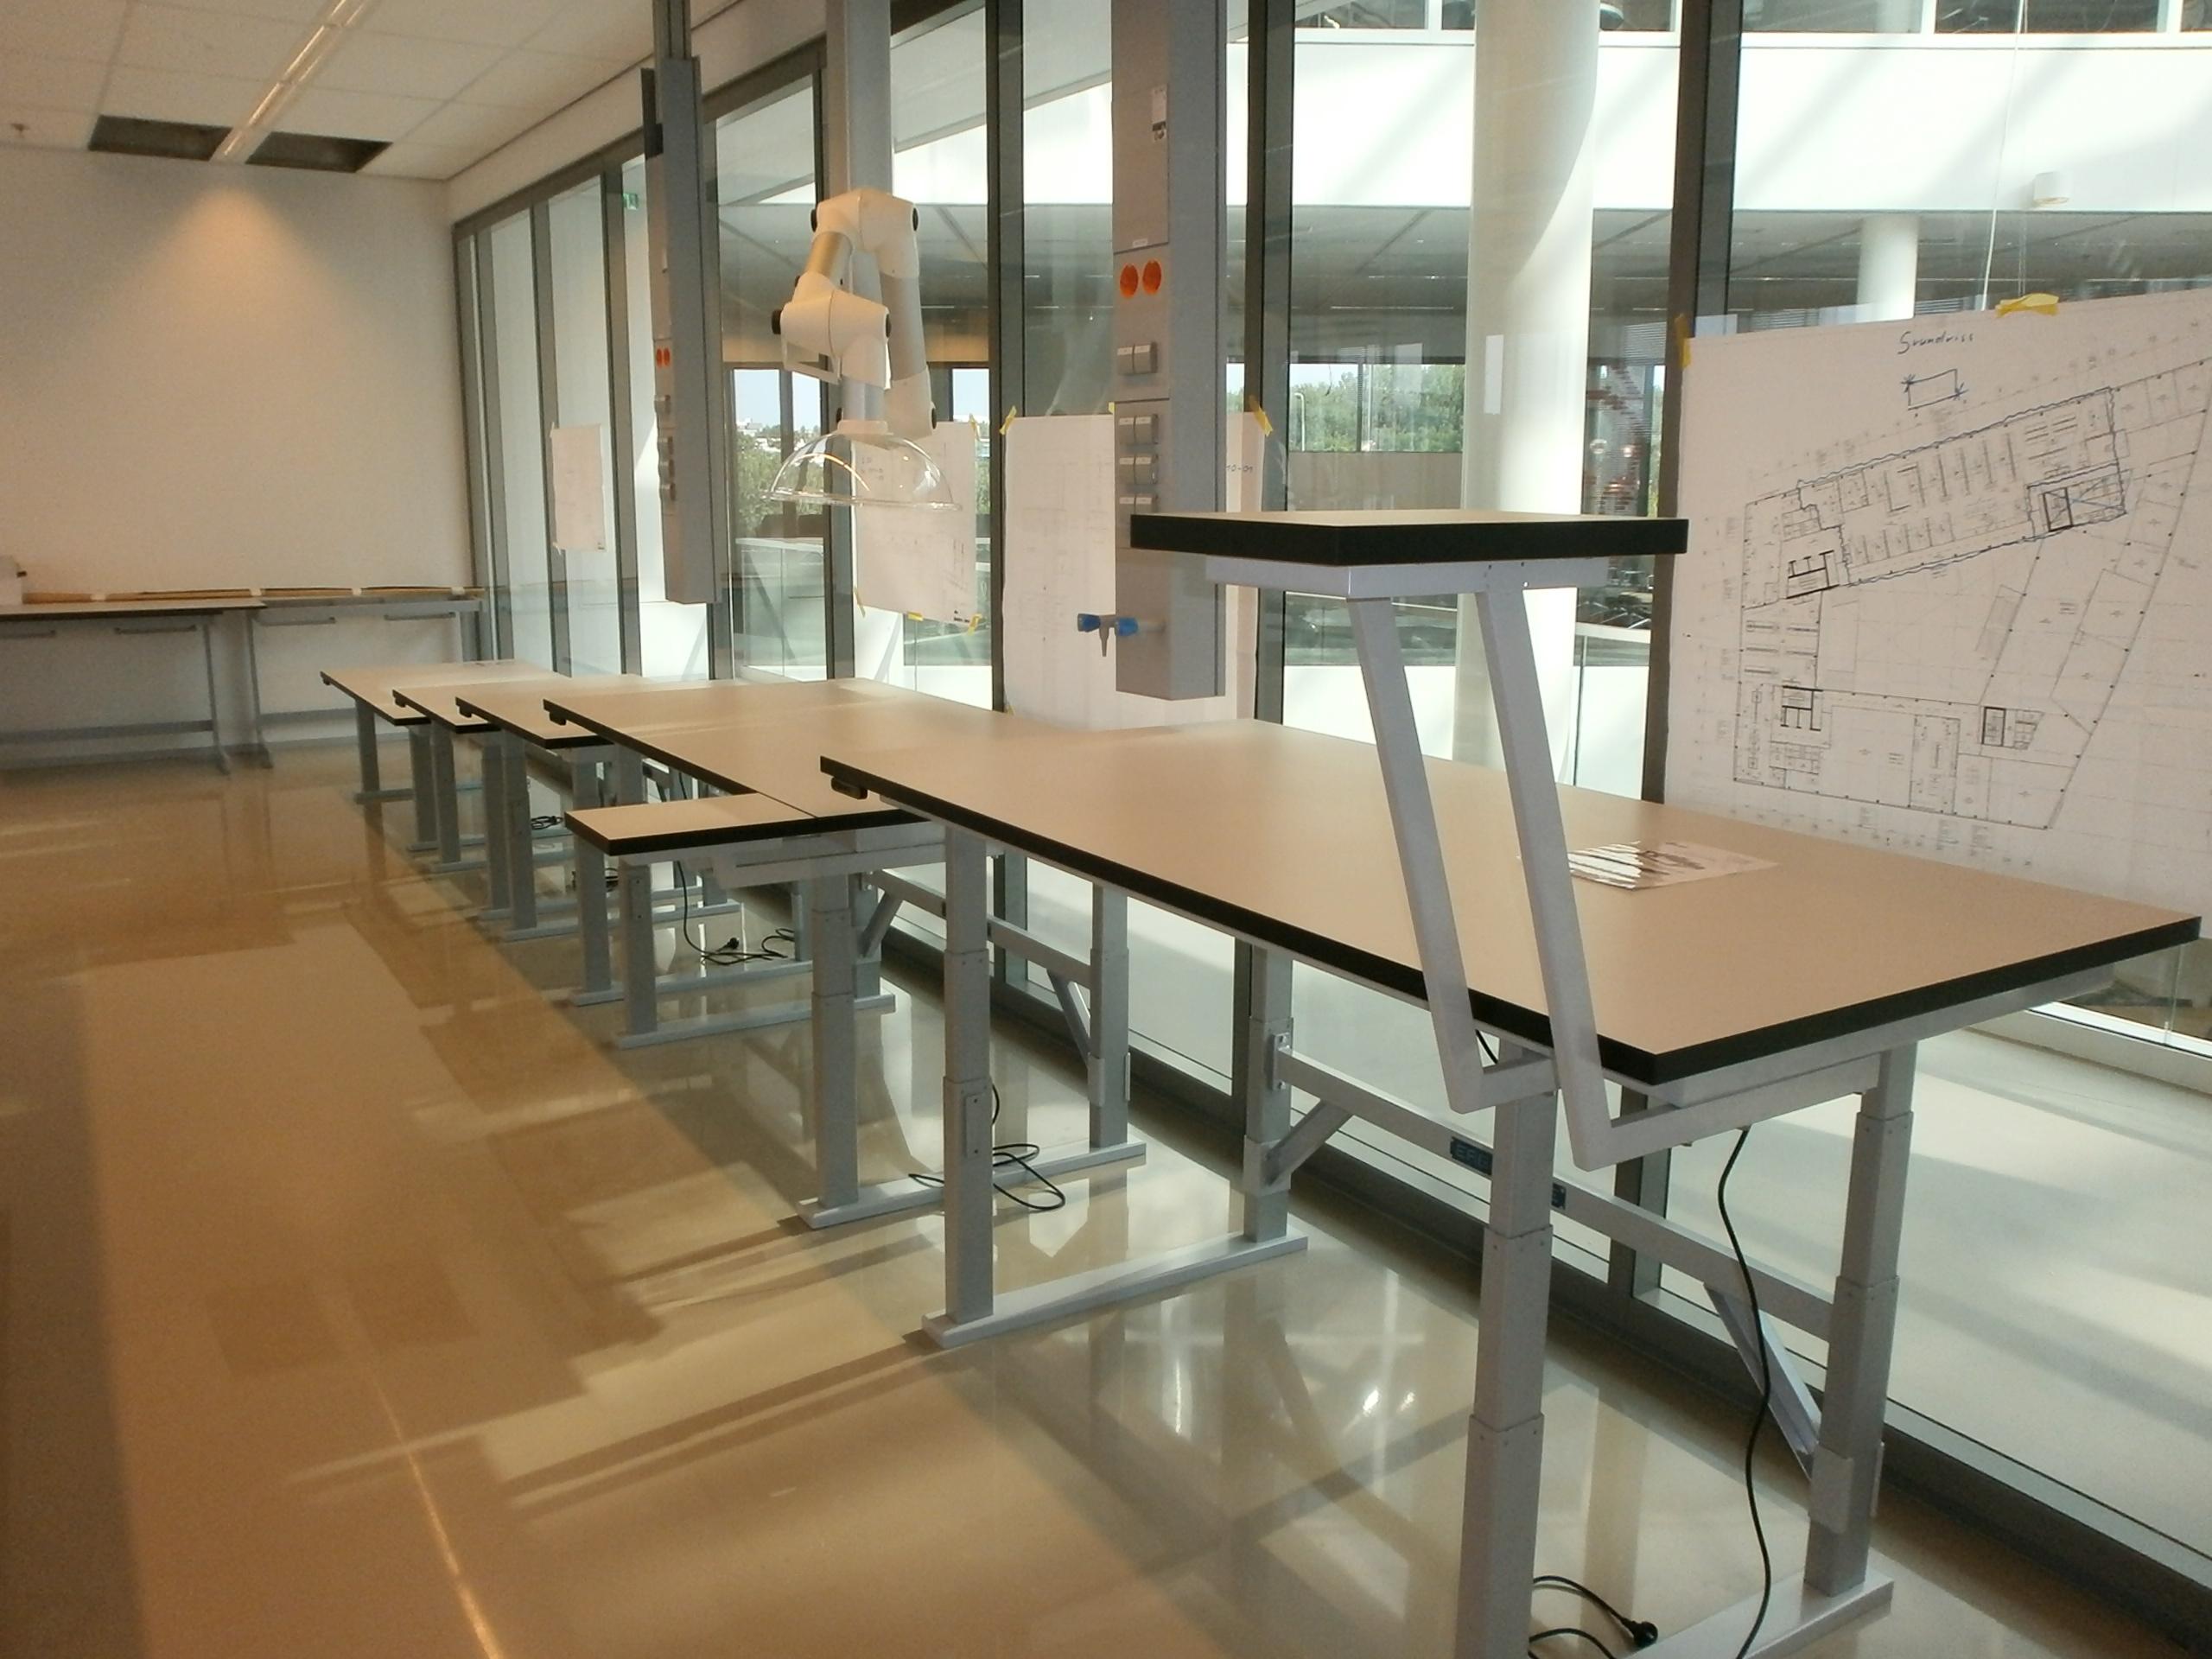 Laboratoriumtafels met extra zijbladen (Avery Dennison)